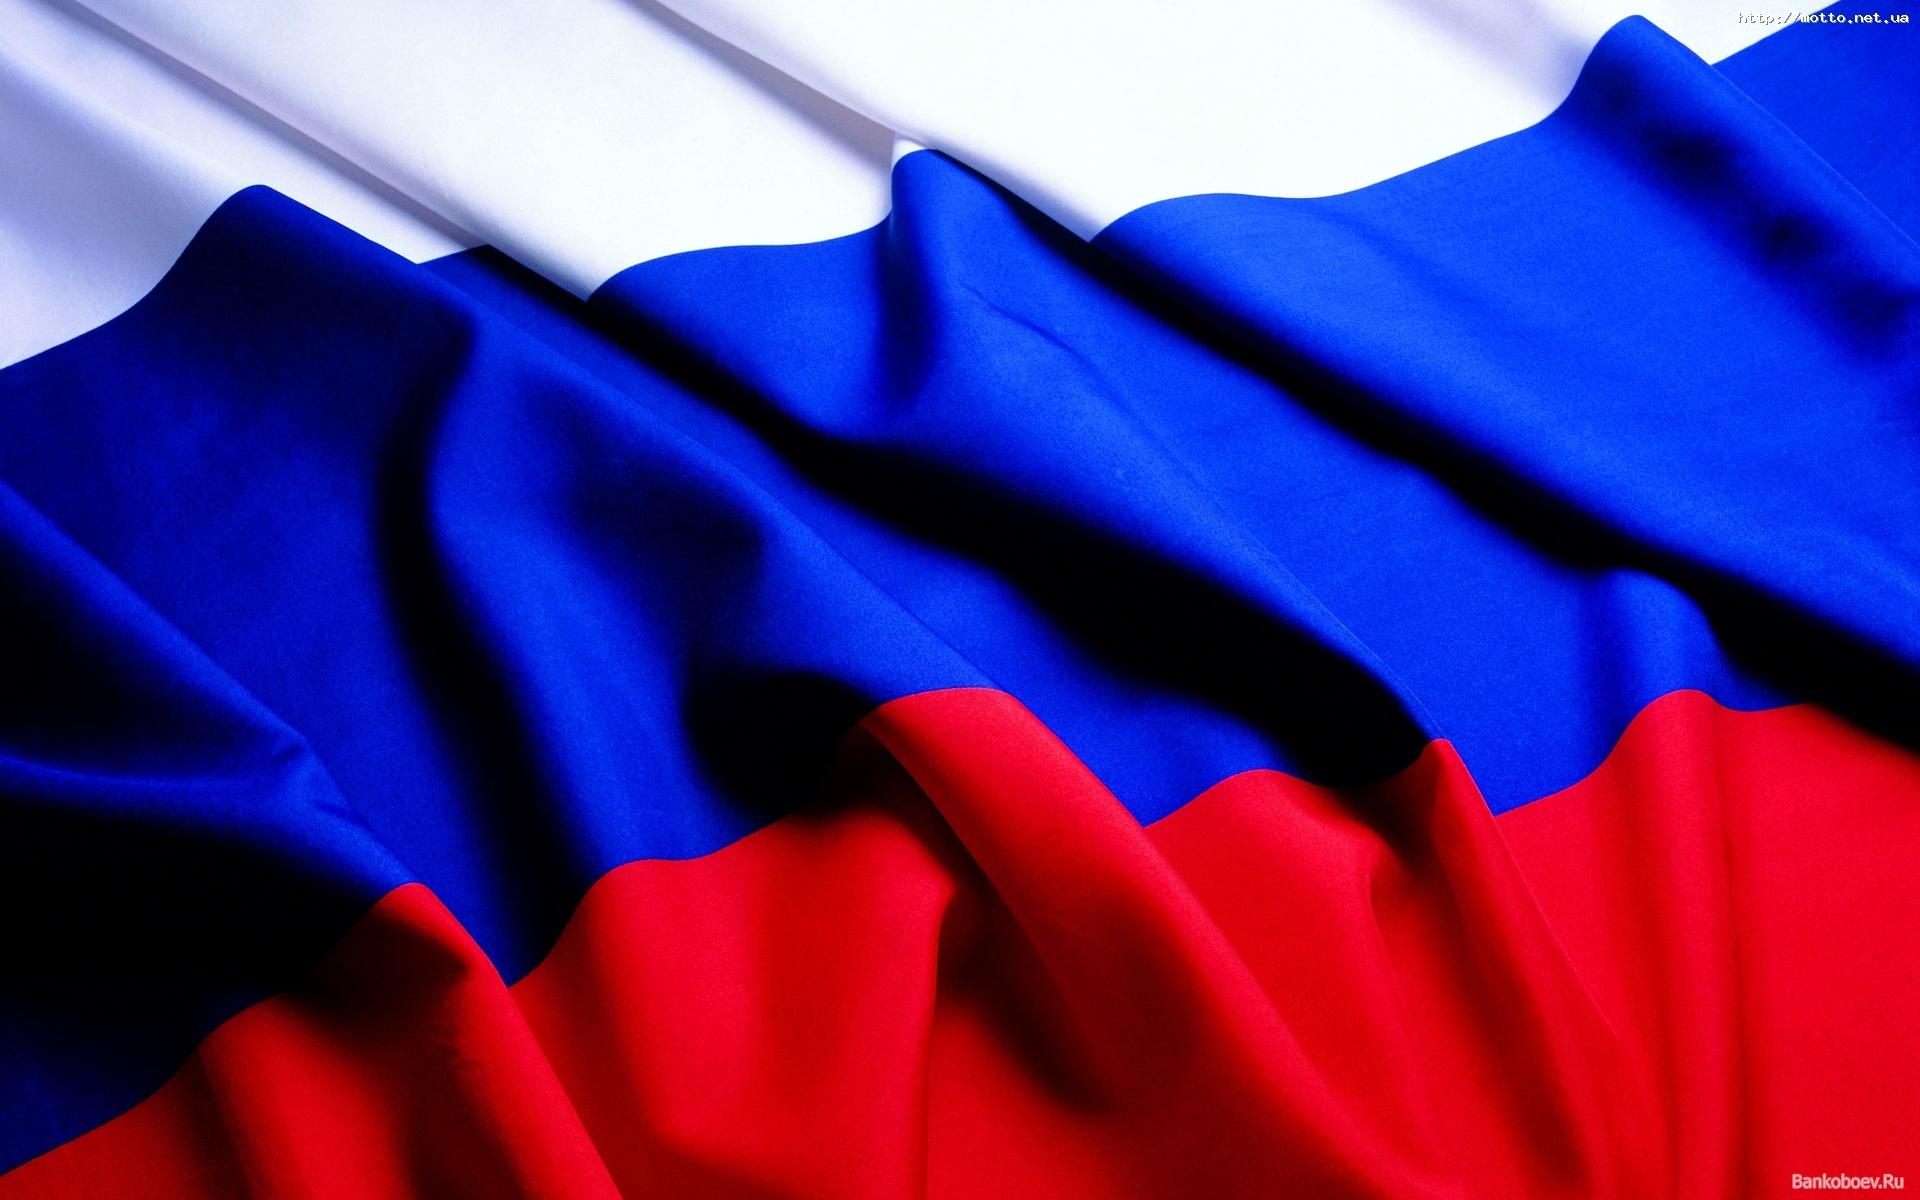 bandera-rusia-wallpaper